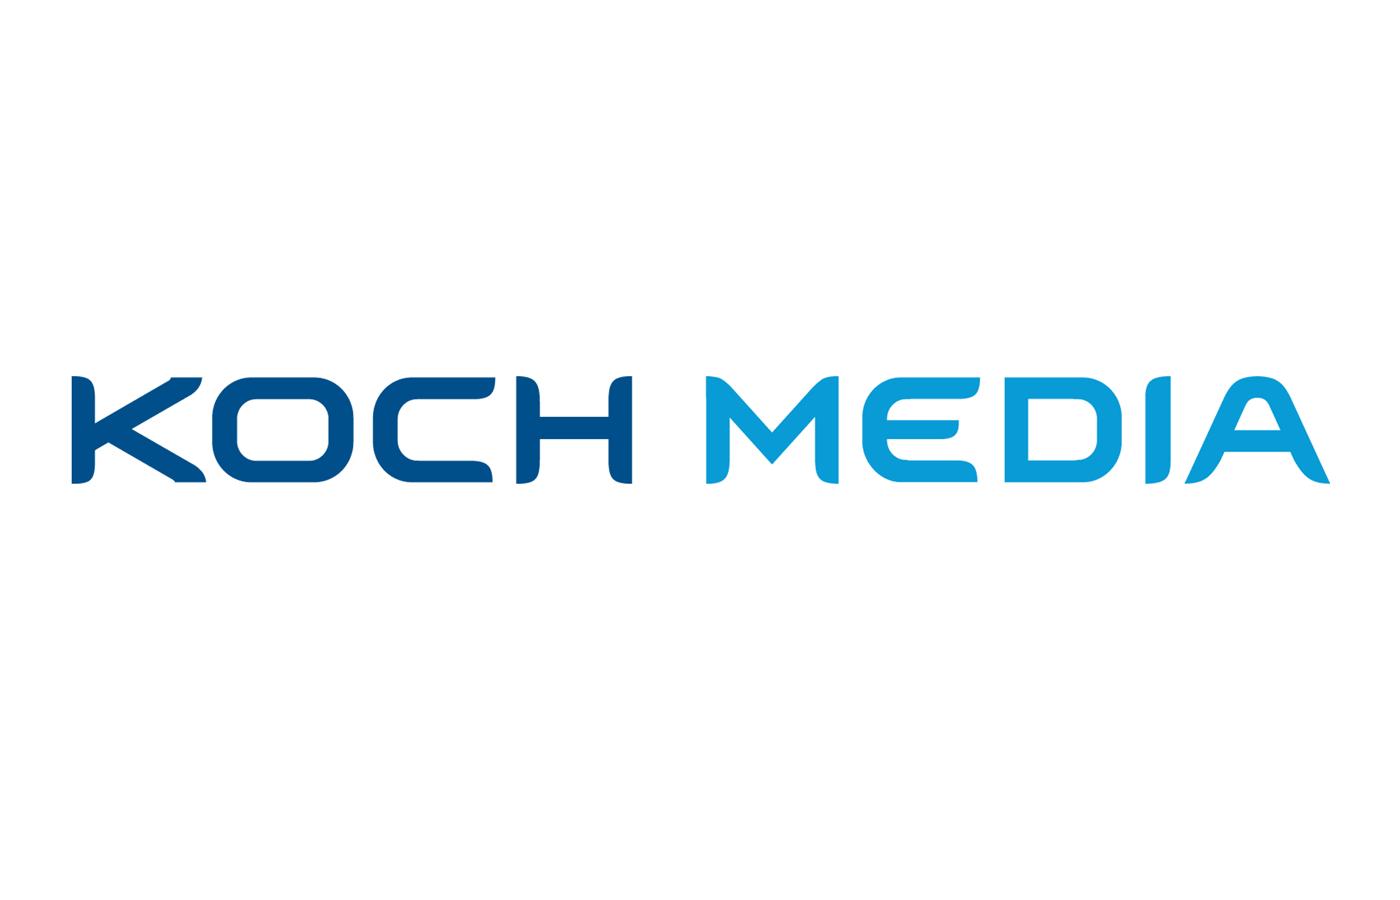 Koch Media e Wizards of the Coast insieme per Dungeons & Dragons: Dark Alliance